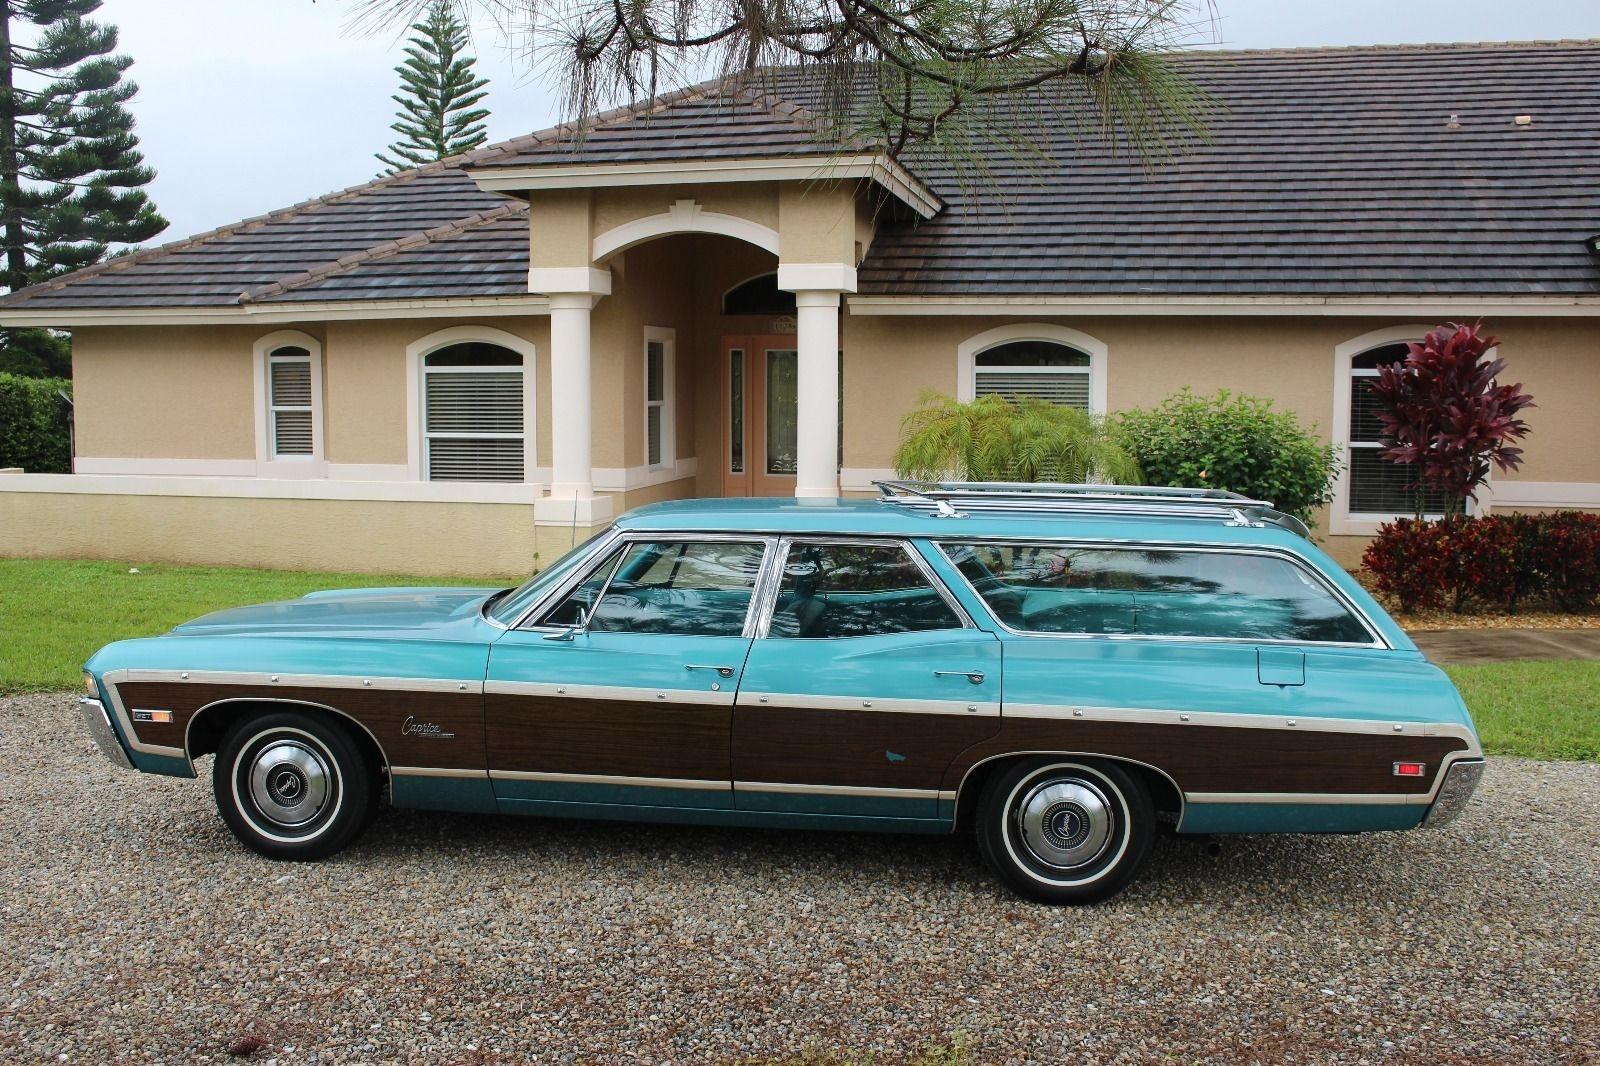 Turquoise Gem 1968 Chevrolet Caprice Wagon Survivor